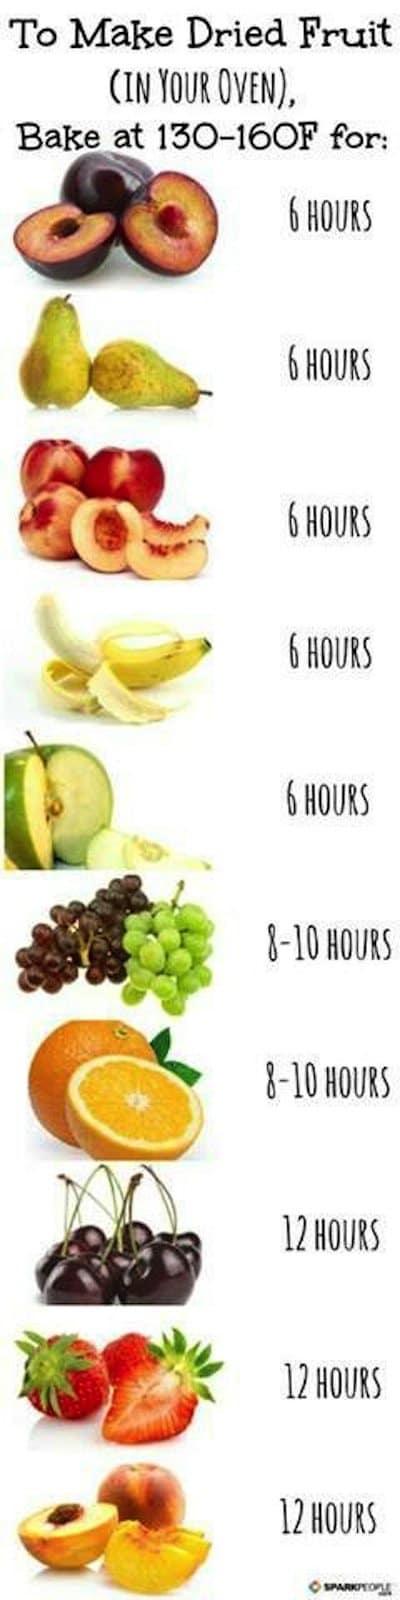 fruit-dried